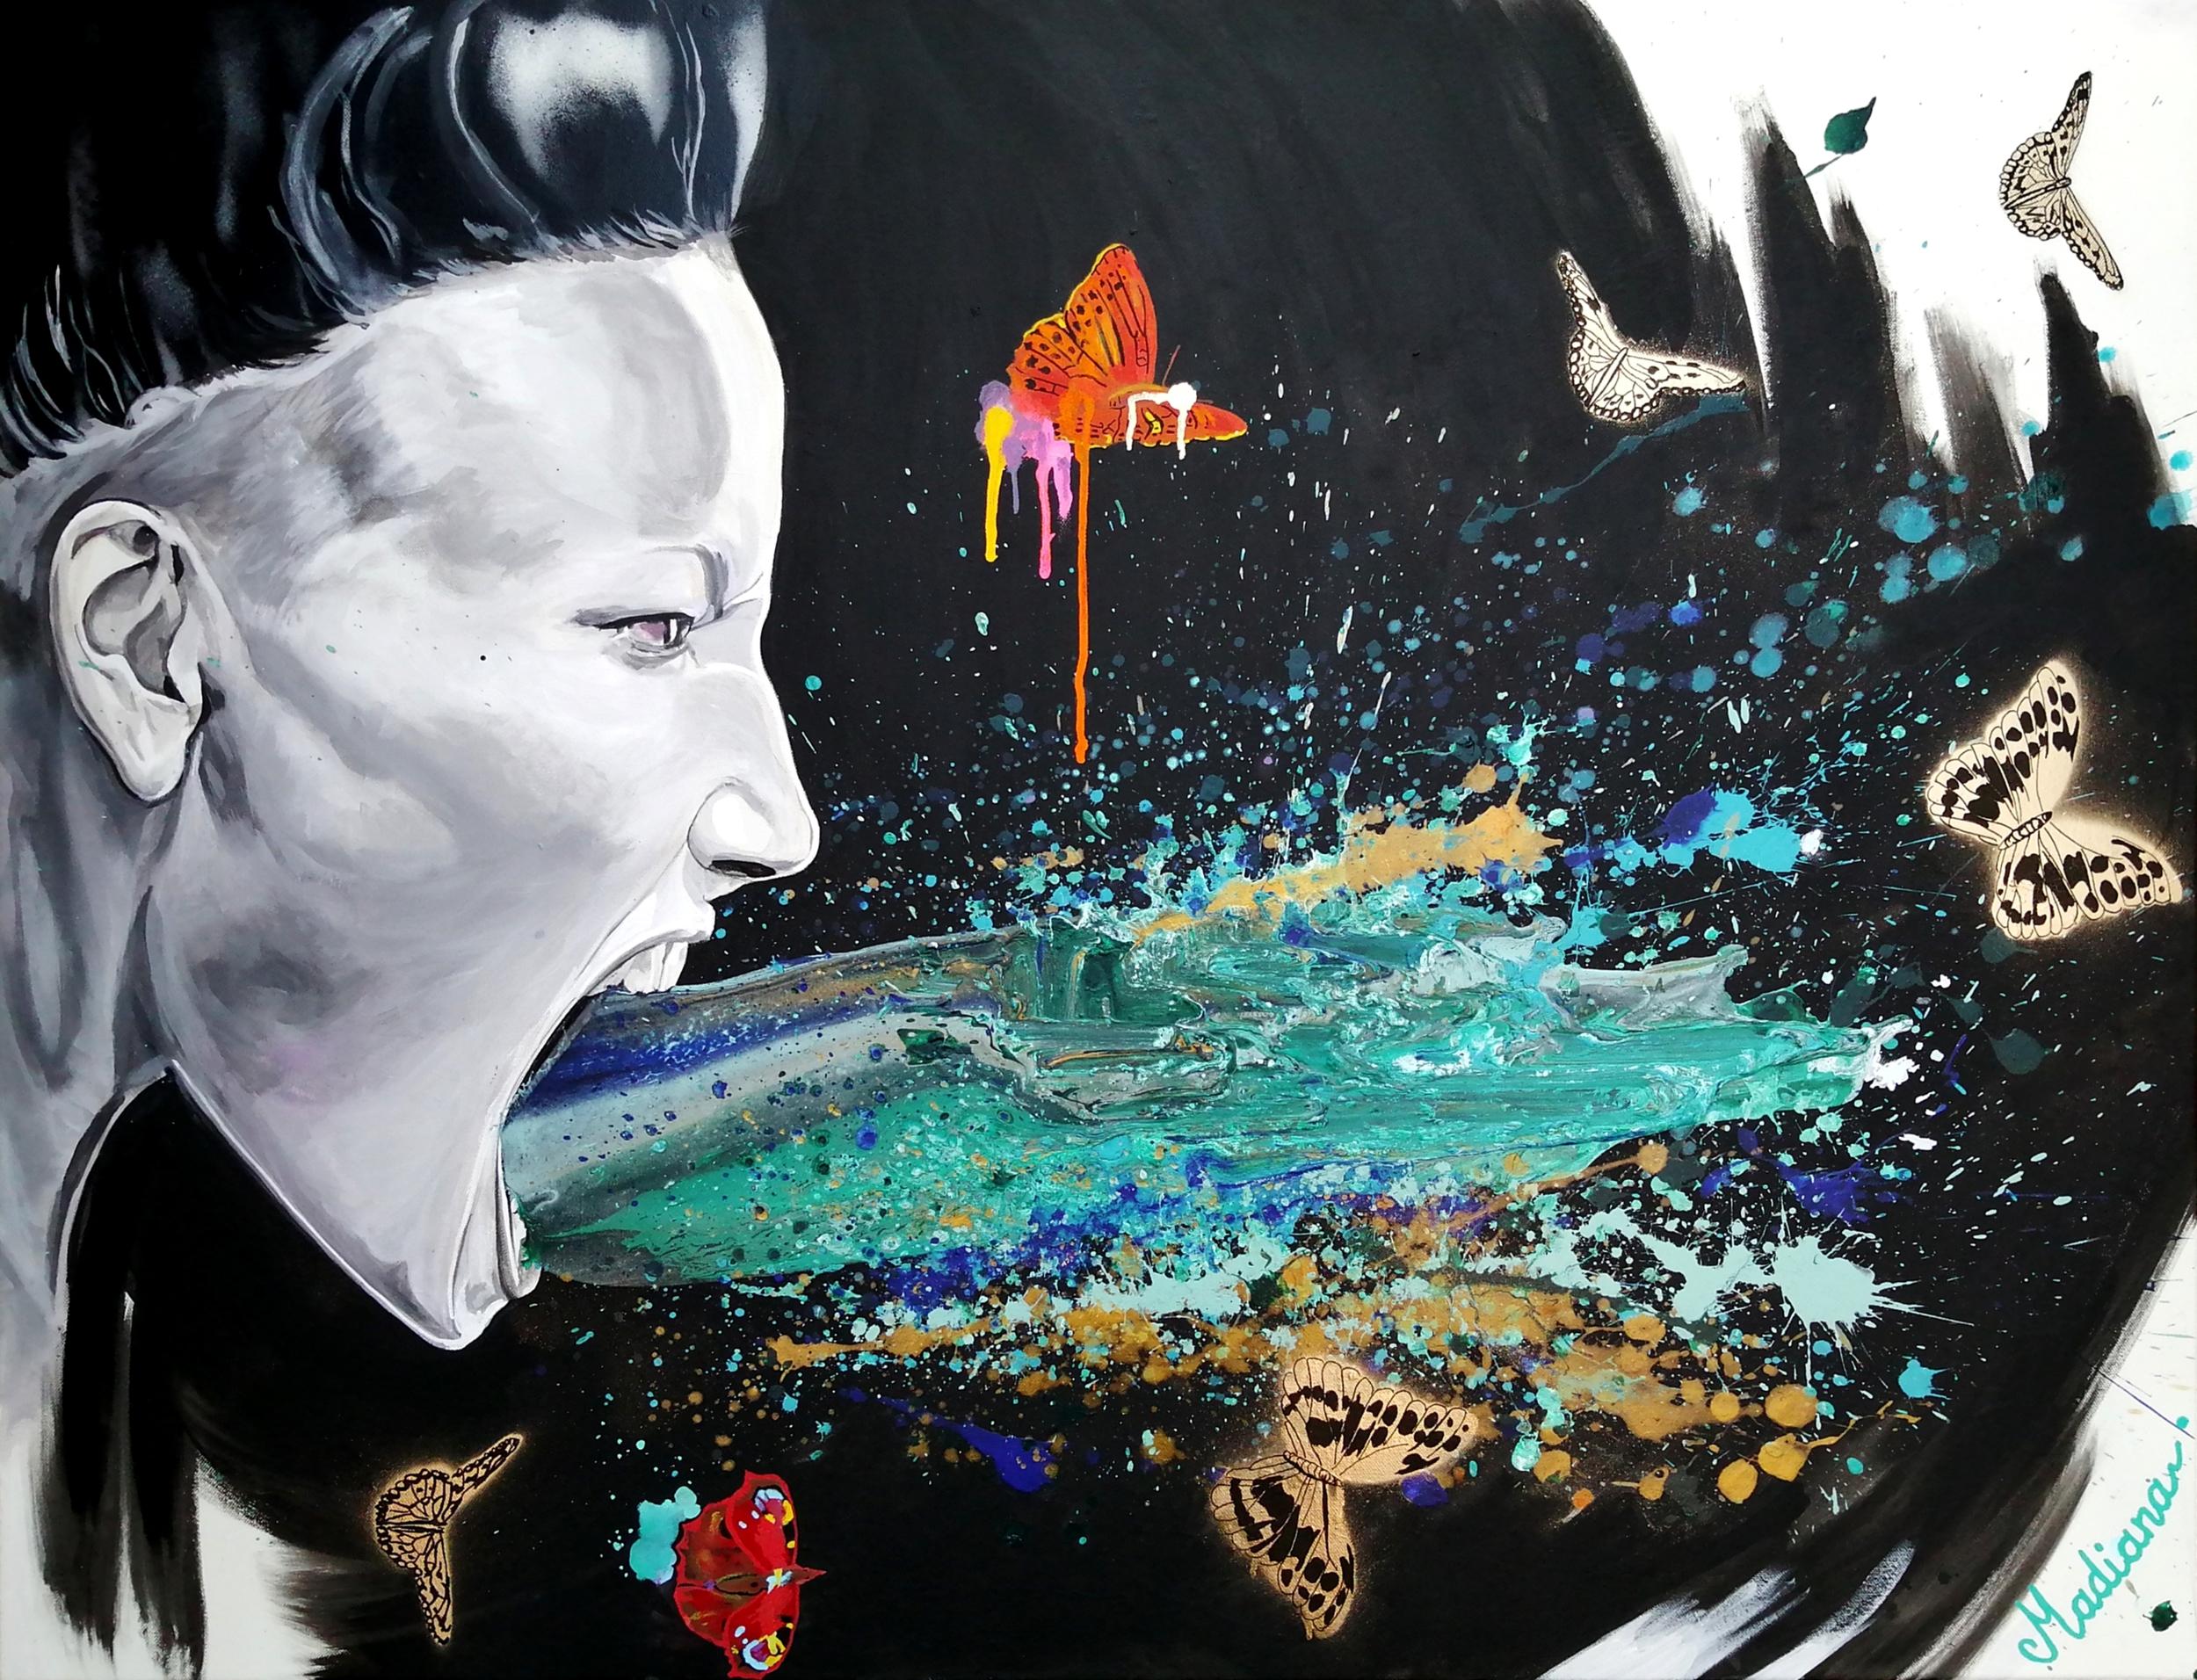 affiche peinture art contemporain street cri femme multicolore